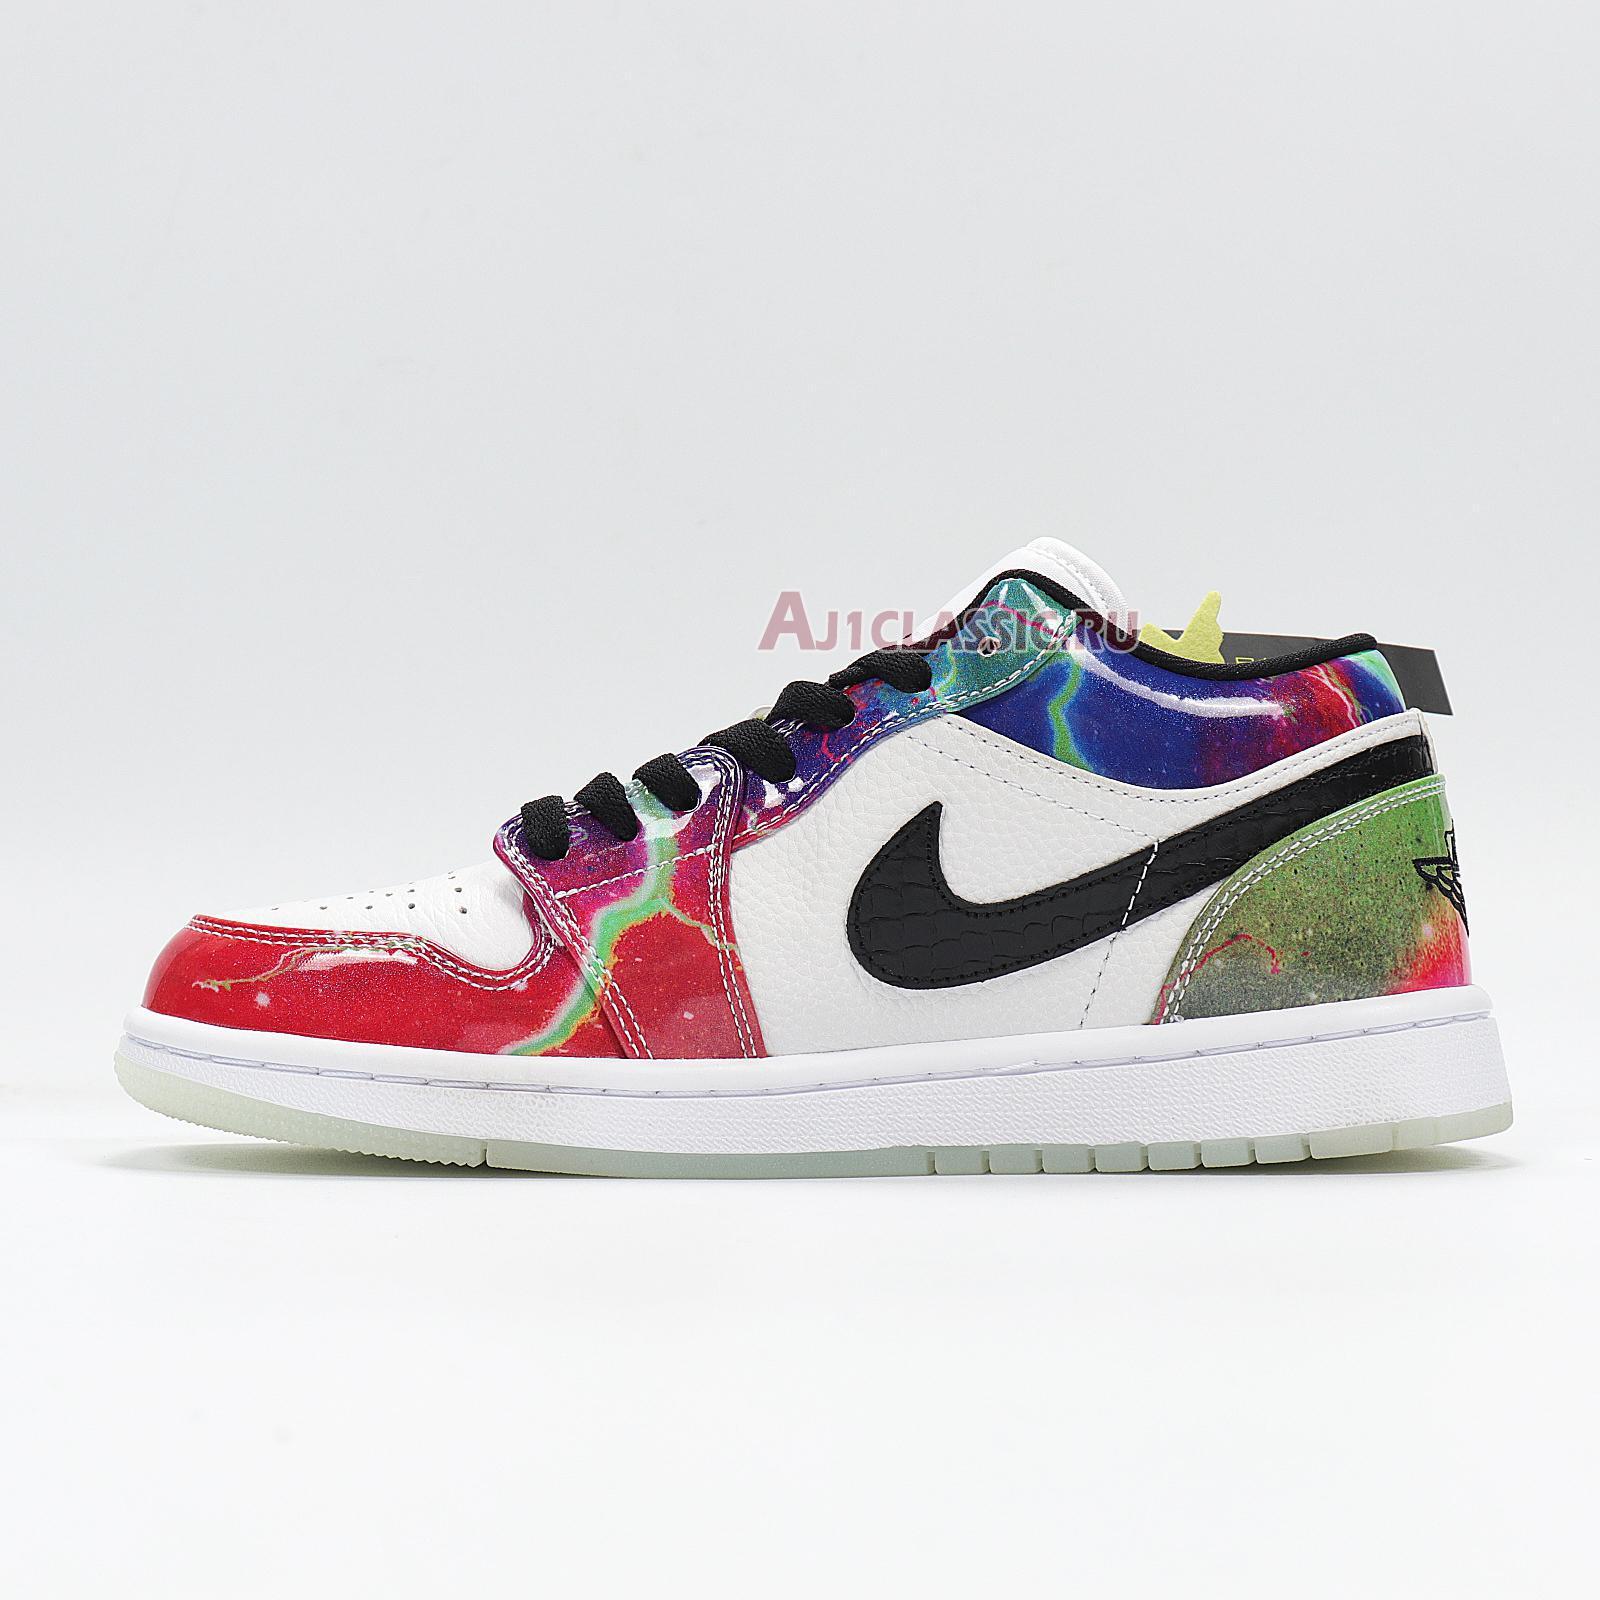 "Air Jordan 1 Low ""Galaxy"" CW7310-909"